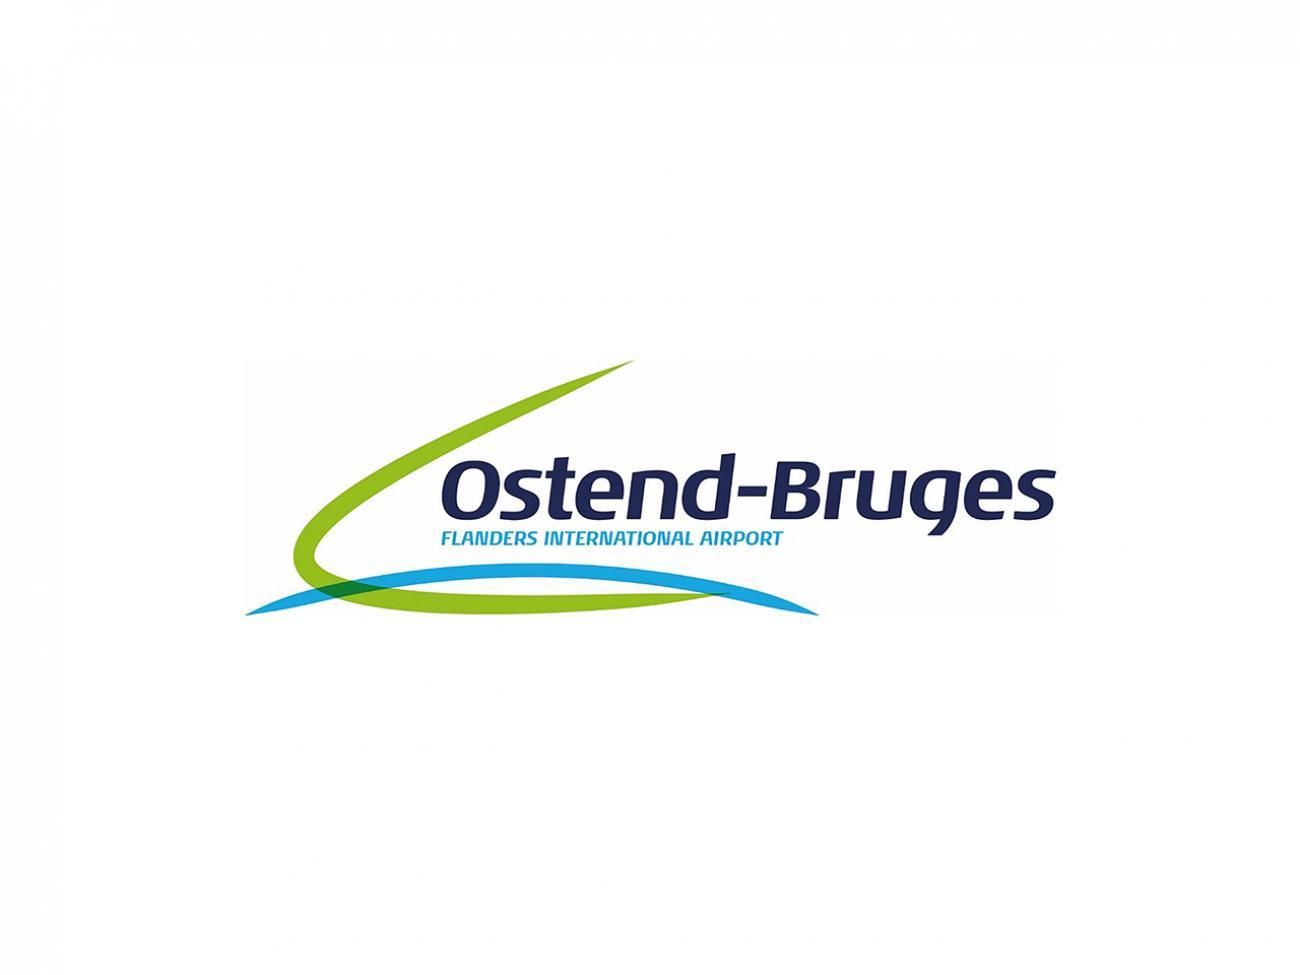 Luchthavenoostendebrugge logo